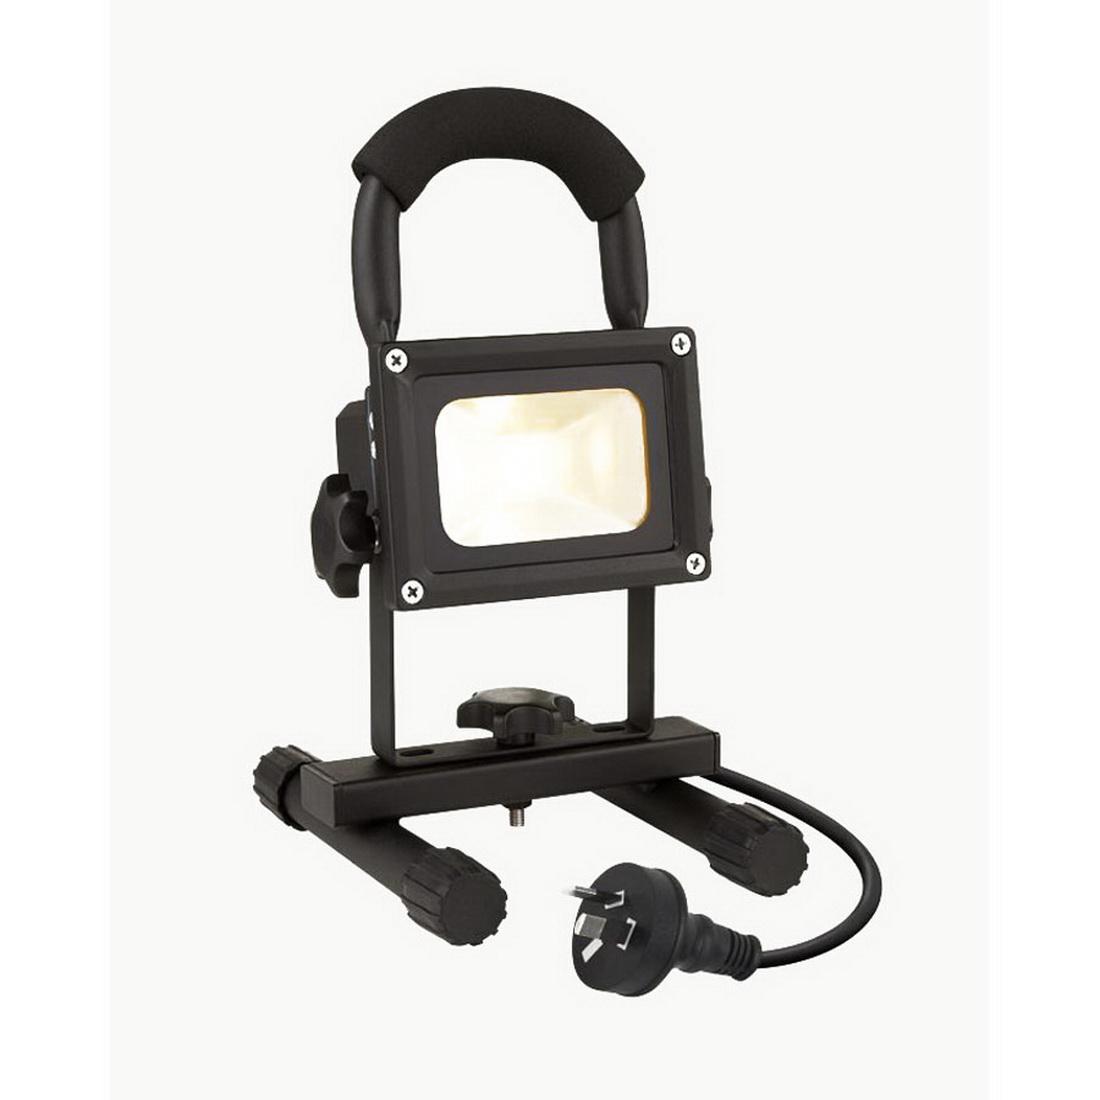 Forta 10W IP44 LED Work Light